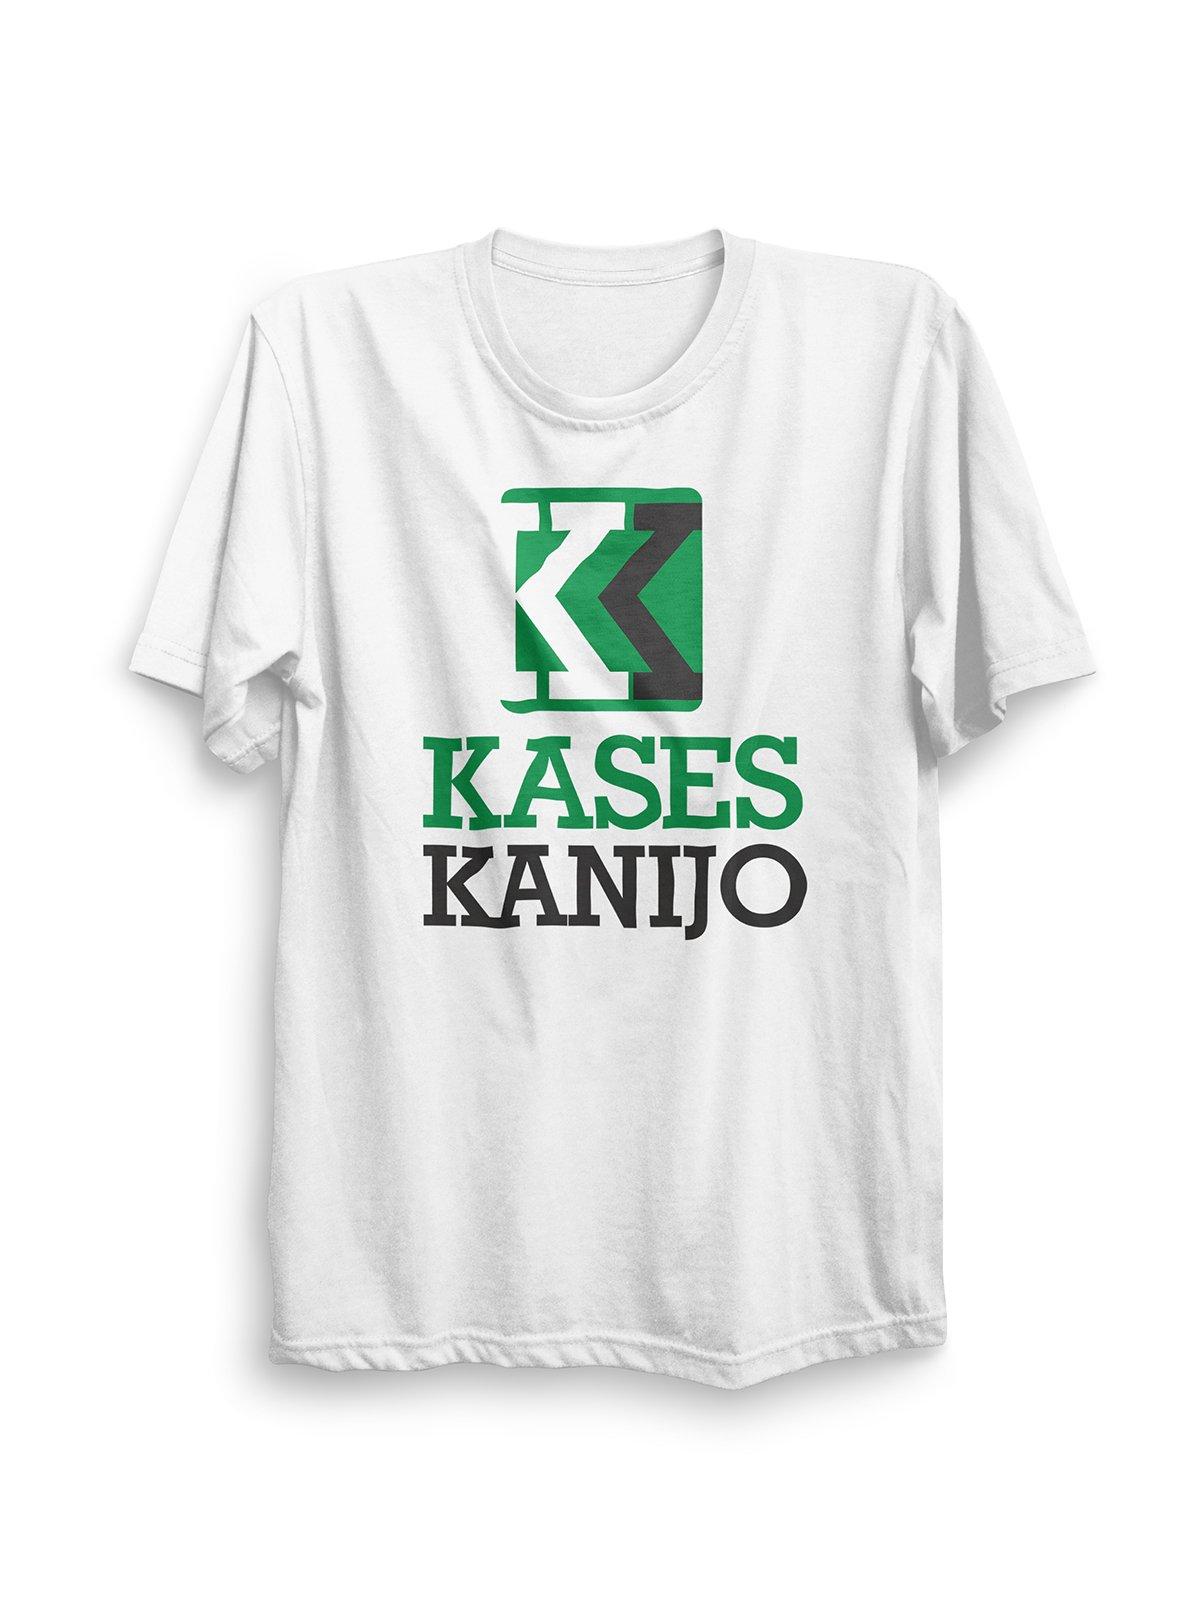 Image of Kases Kanijo